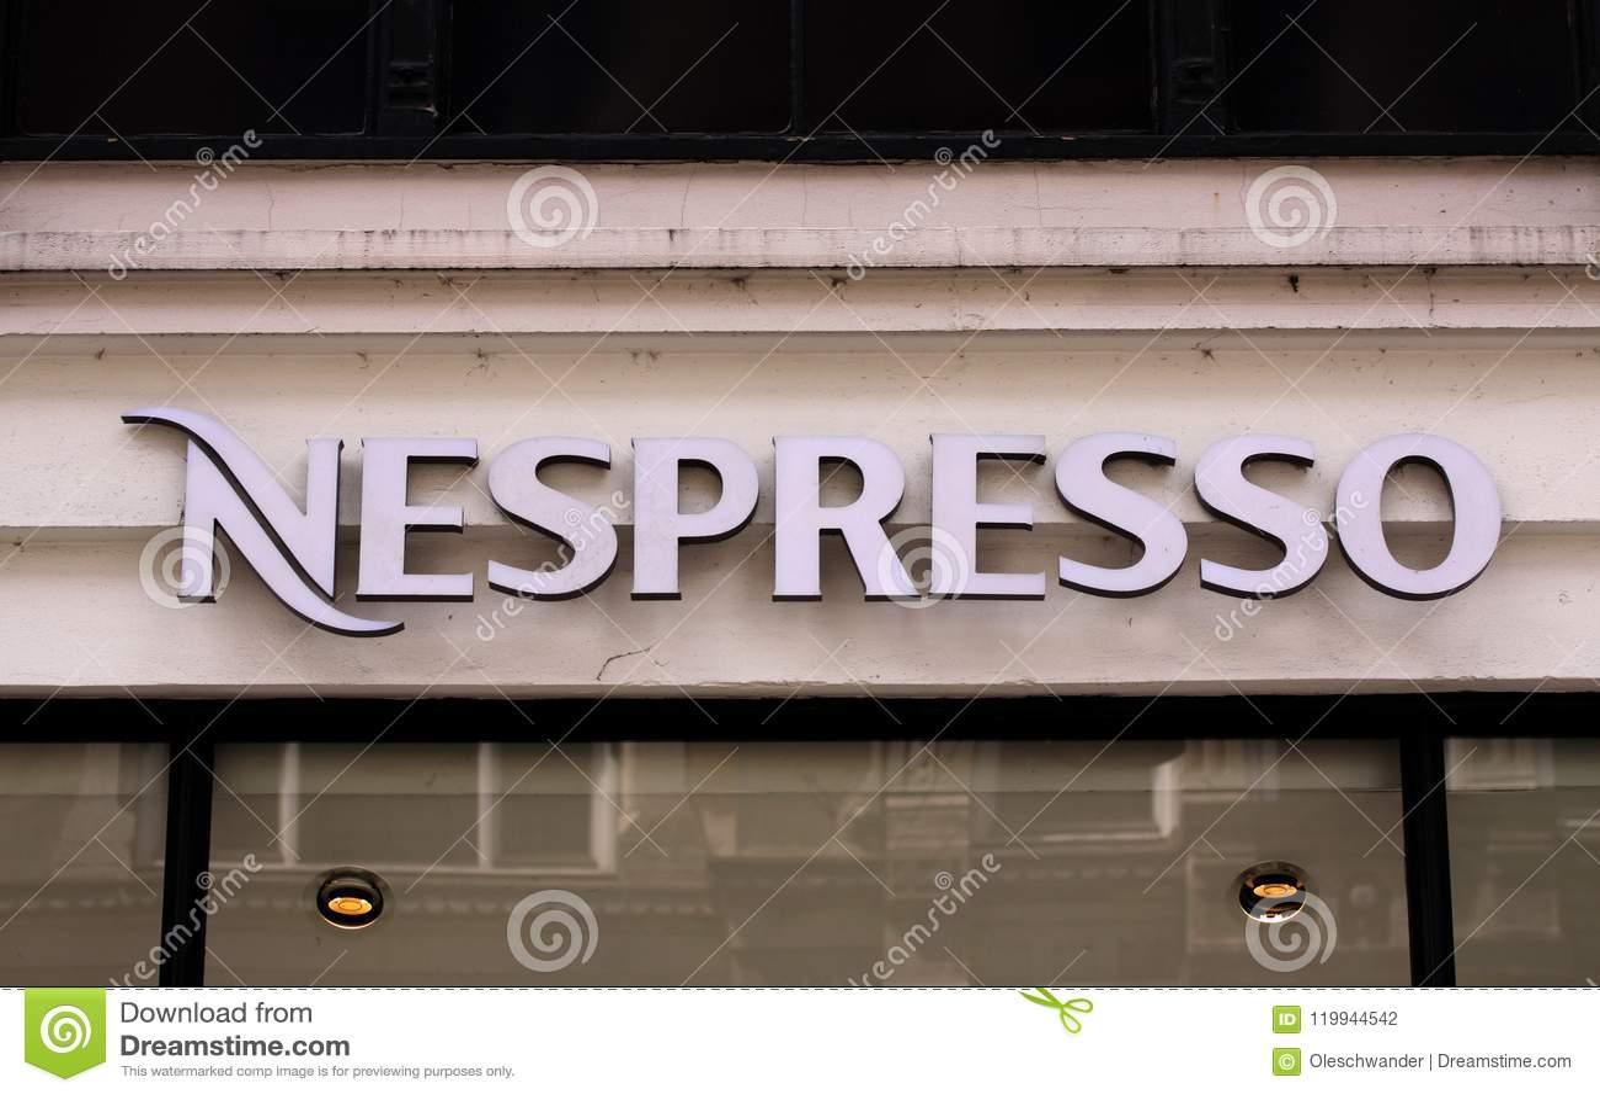 Nespresso Coffee House Store Logo On Shop Panel Nespresso Nestle